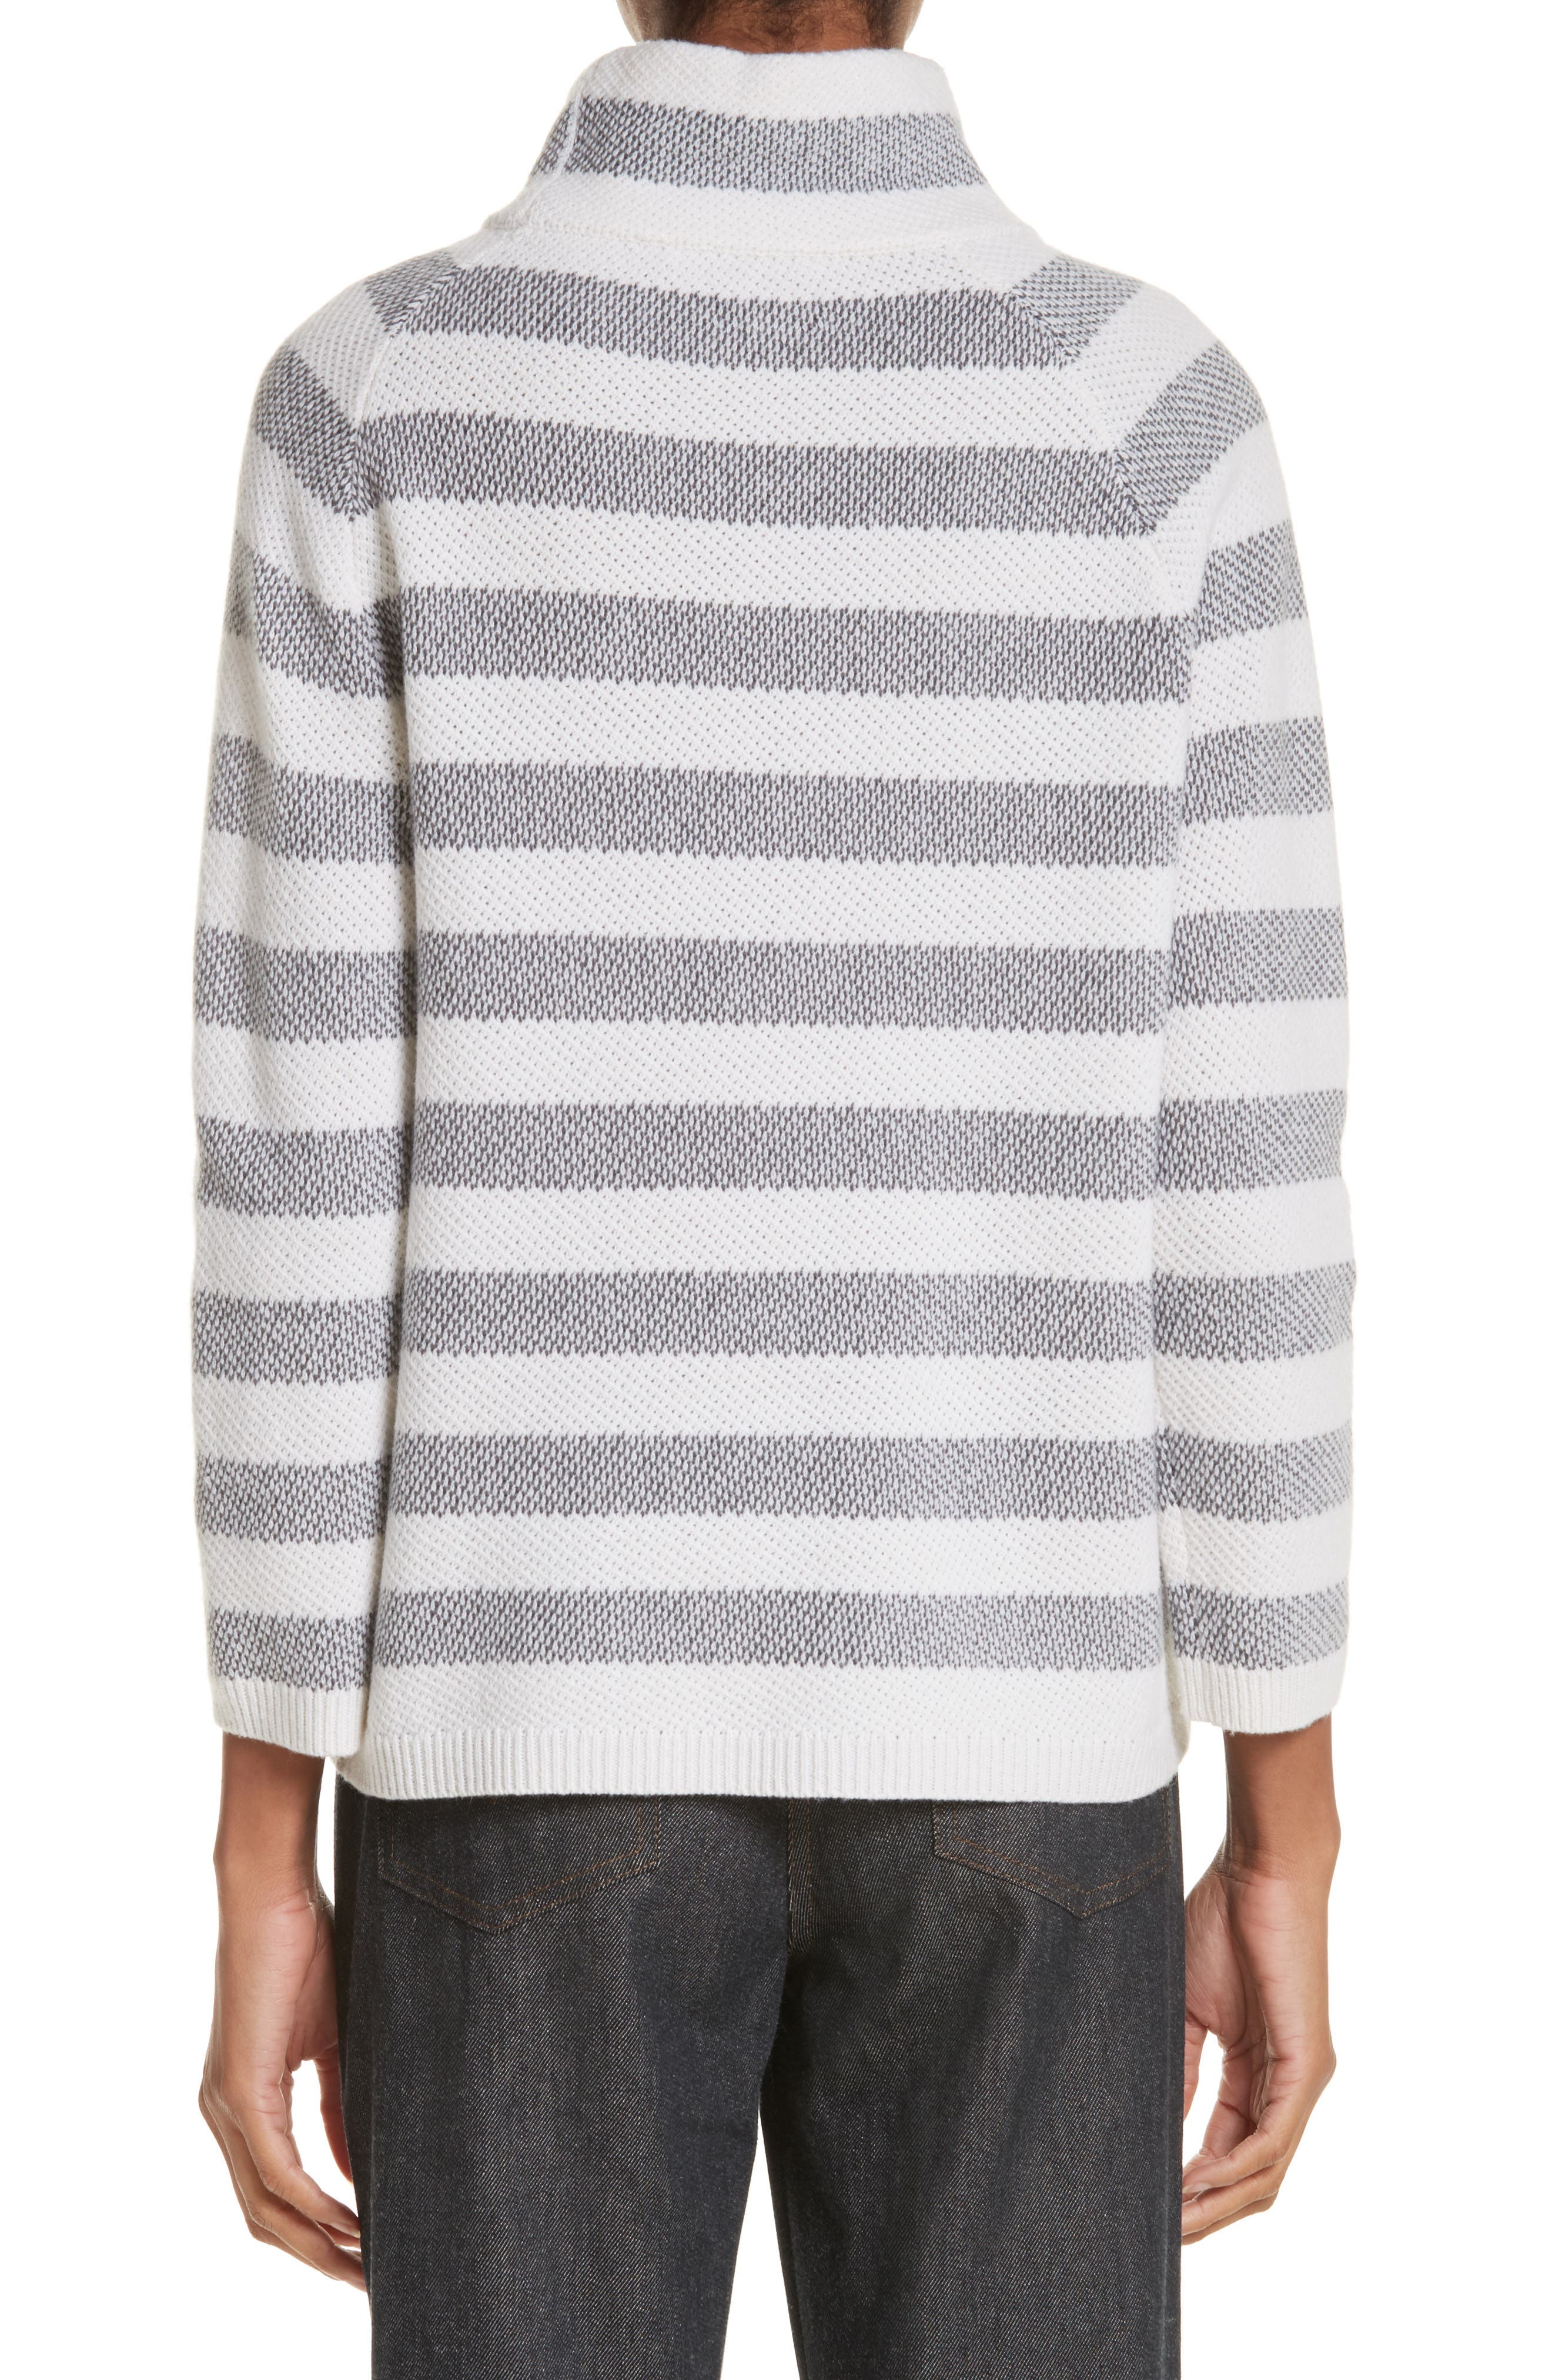 Osvaldo Cashmere Sweater,                             Alternate thumbnail 2, color,                             034